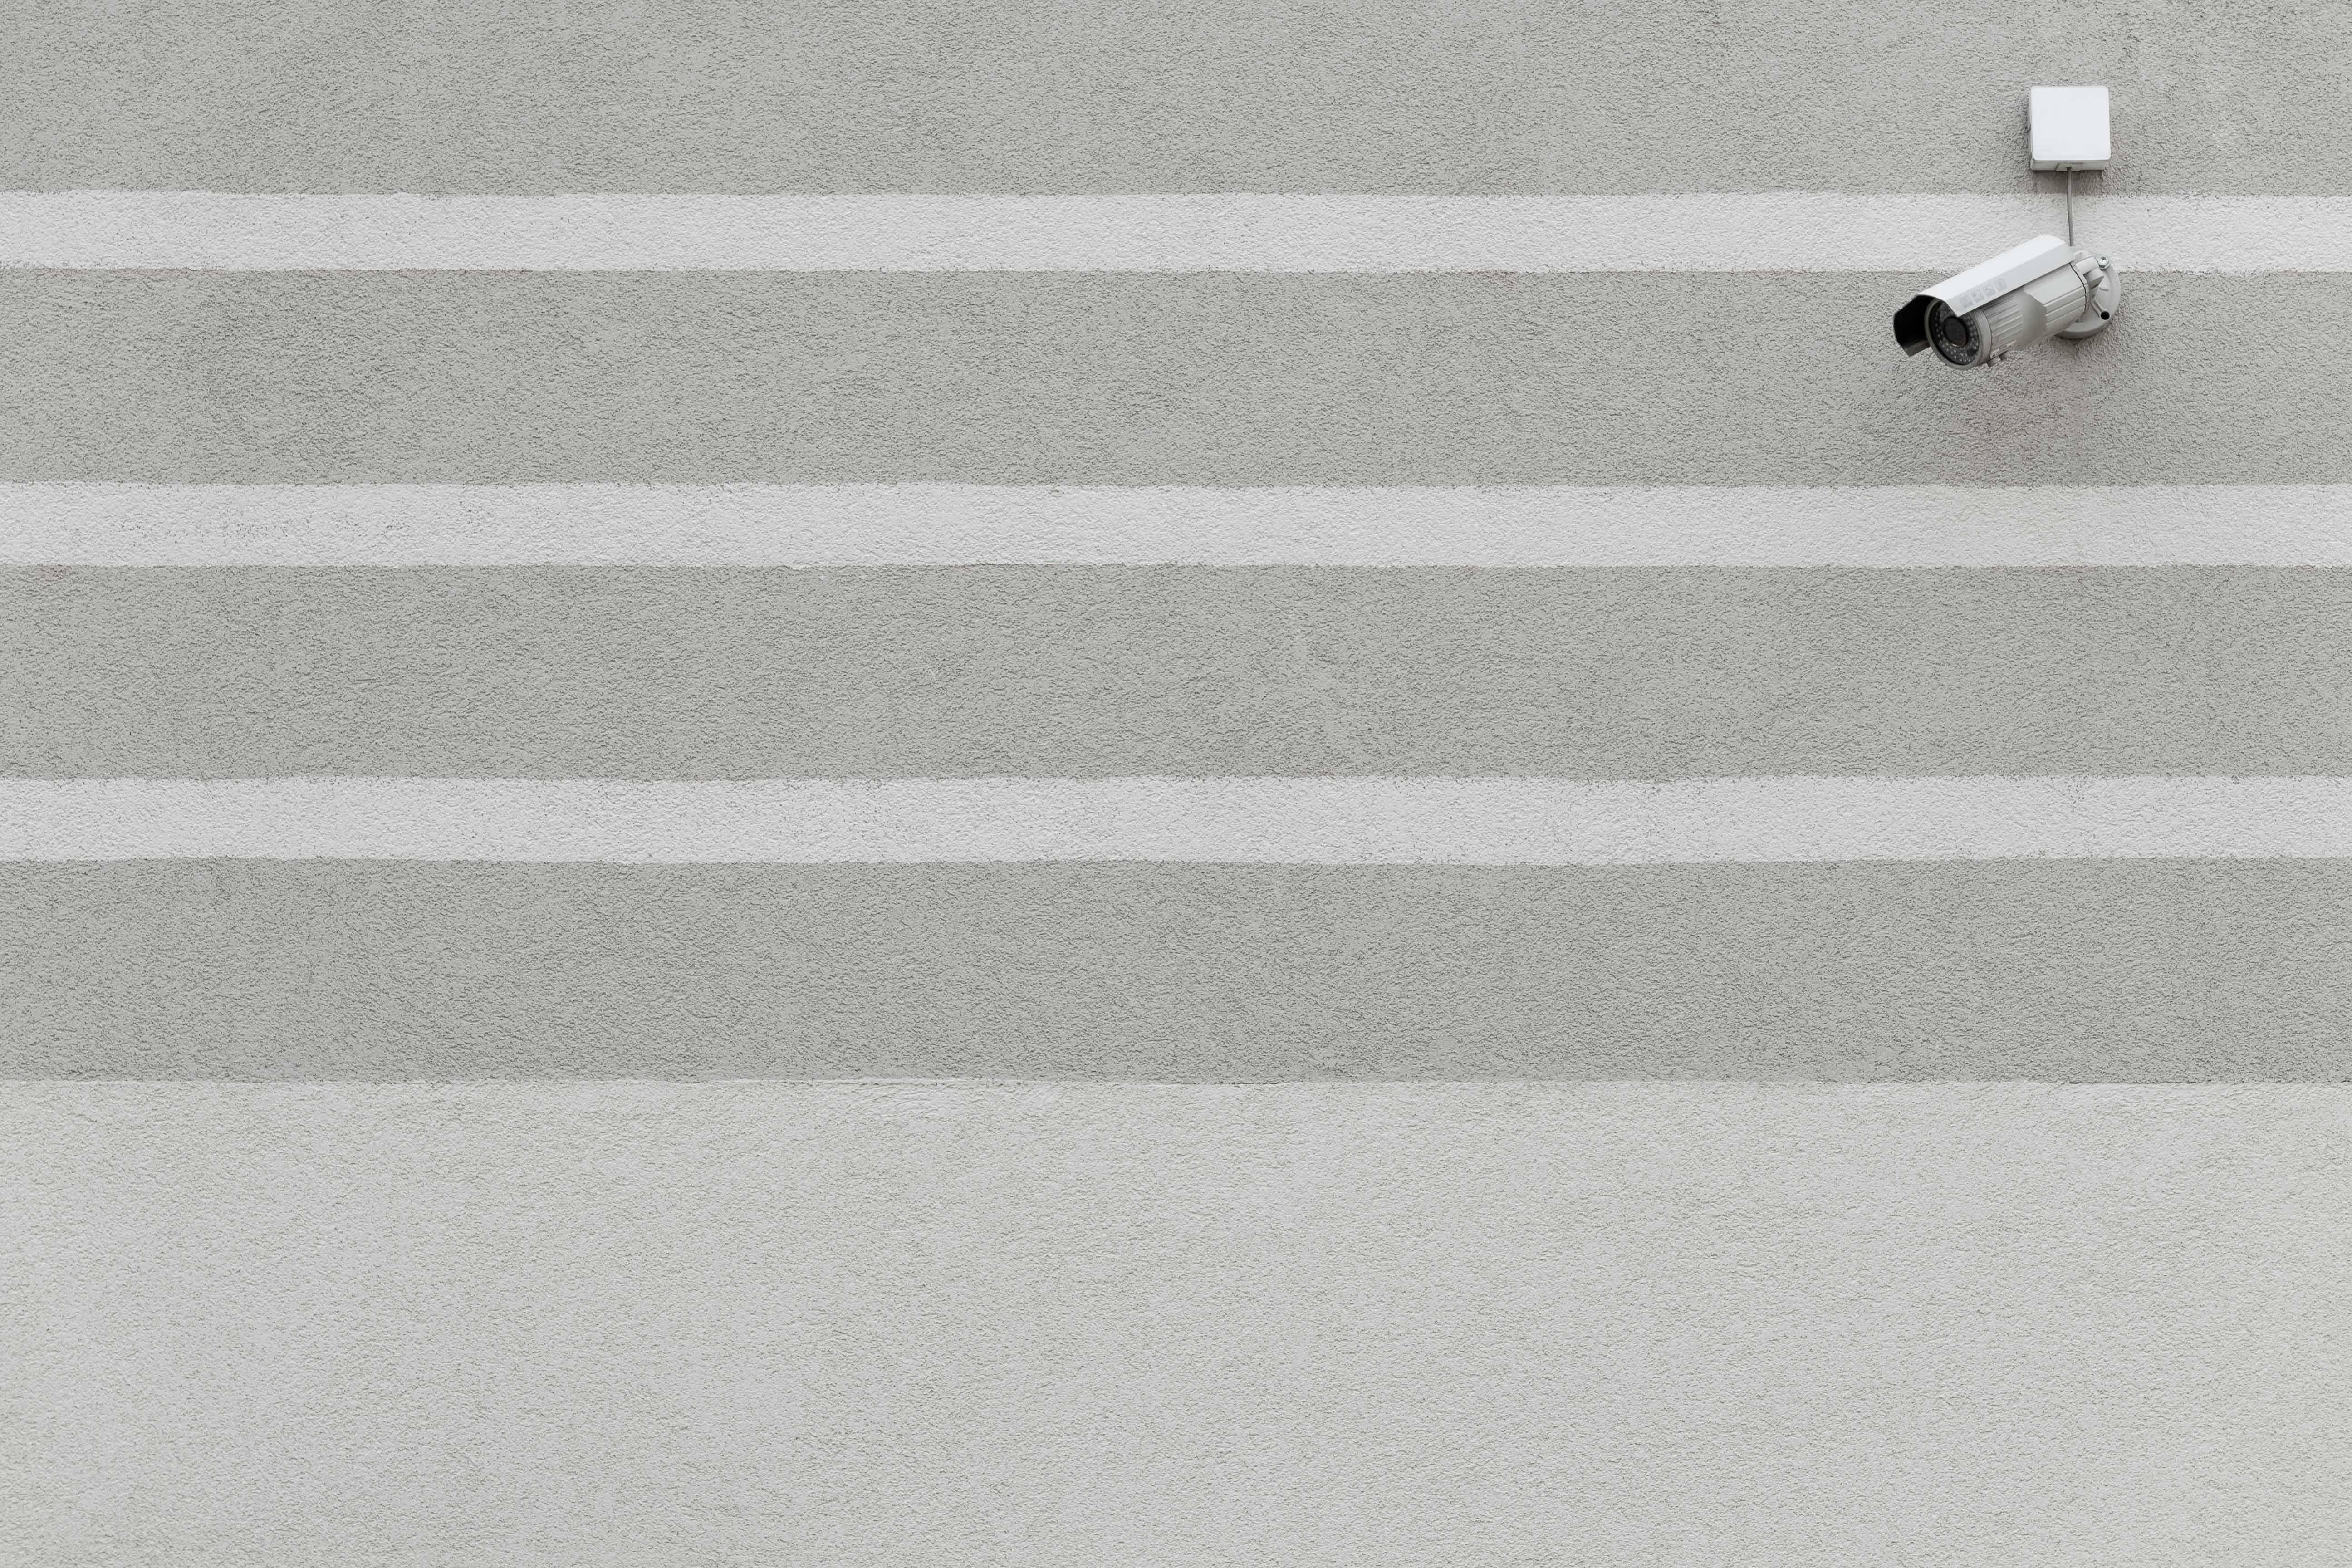 white surveillance camera